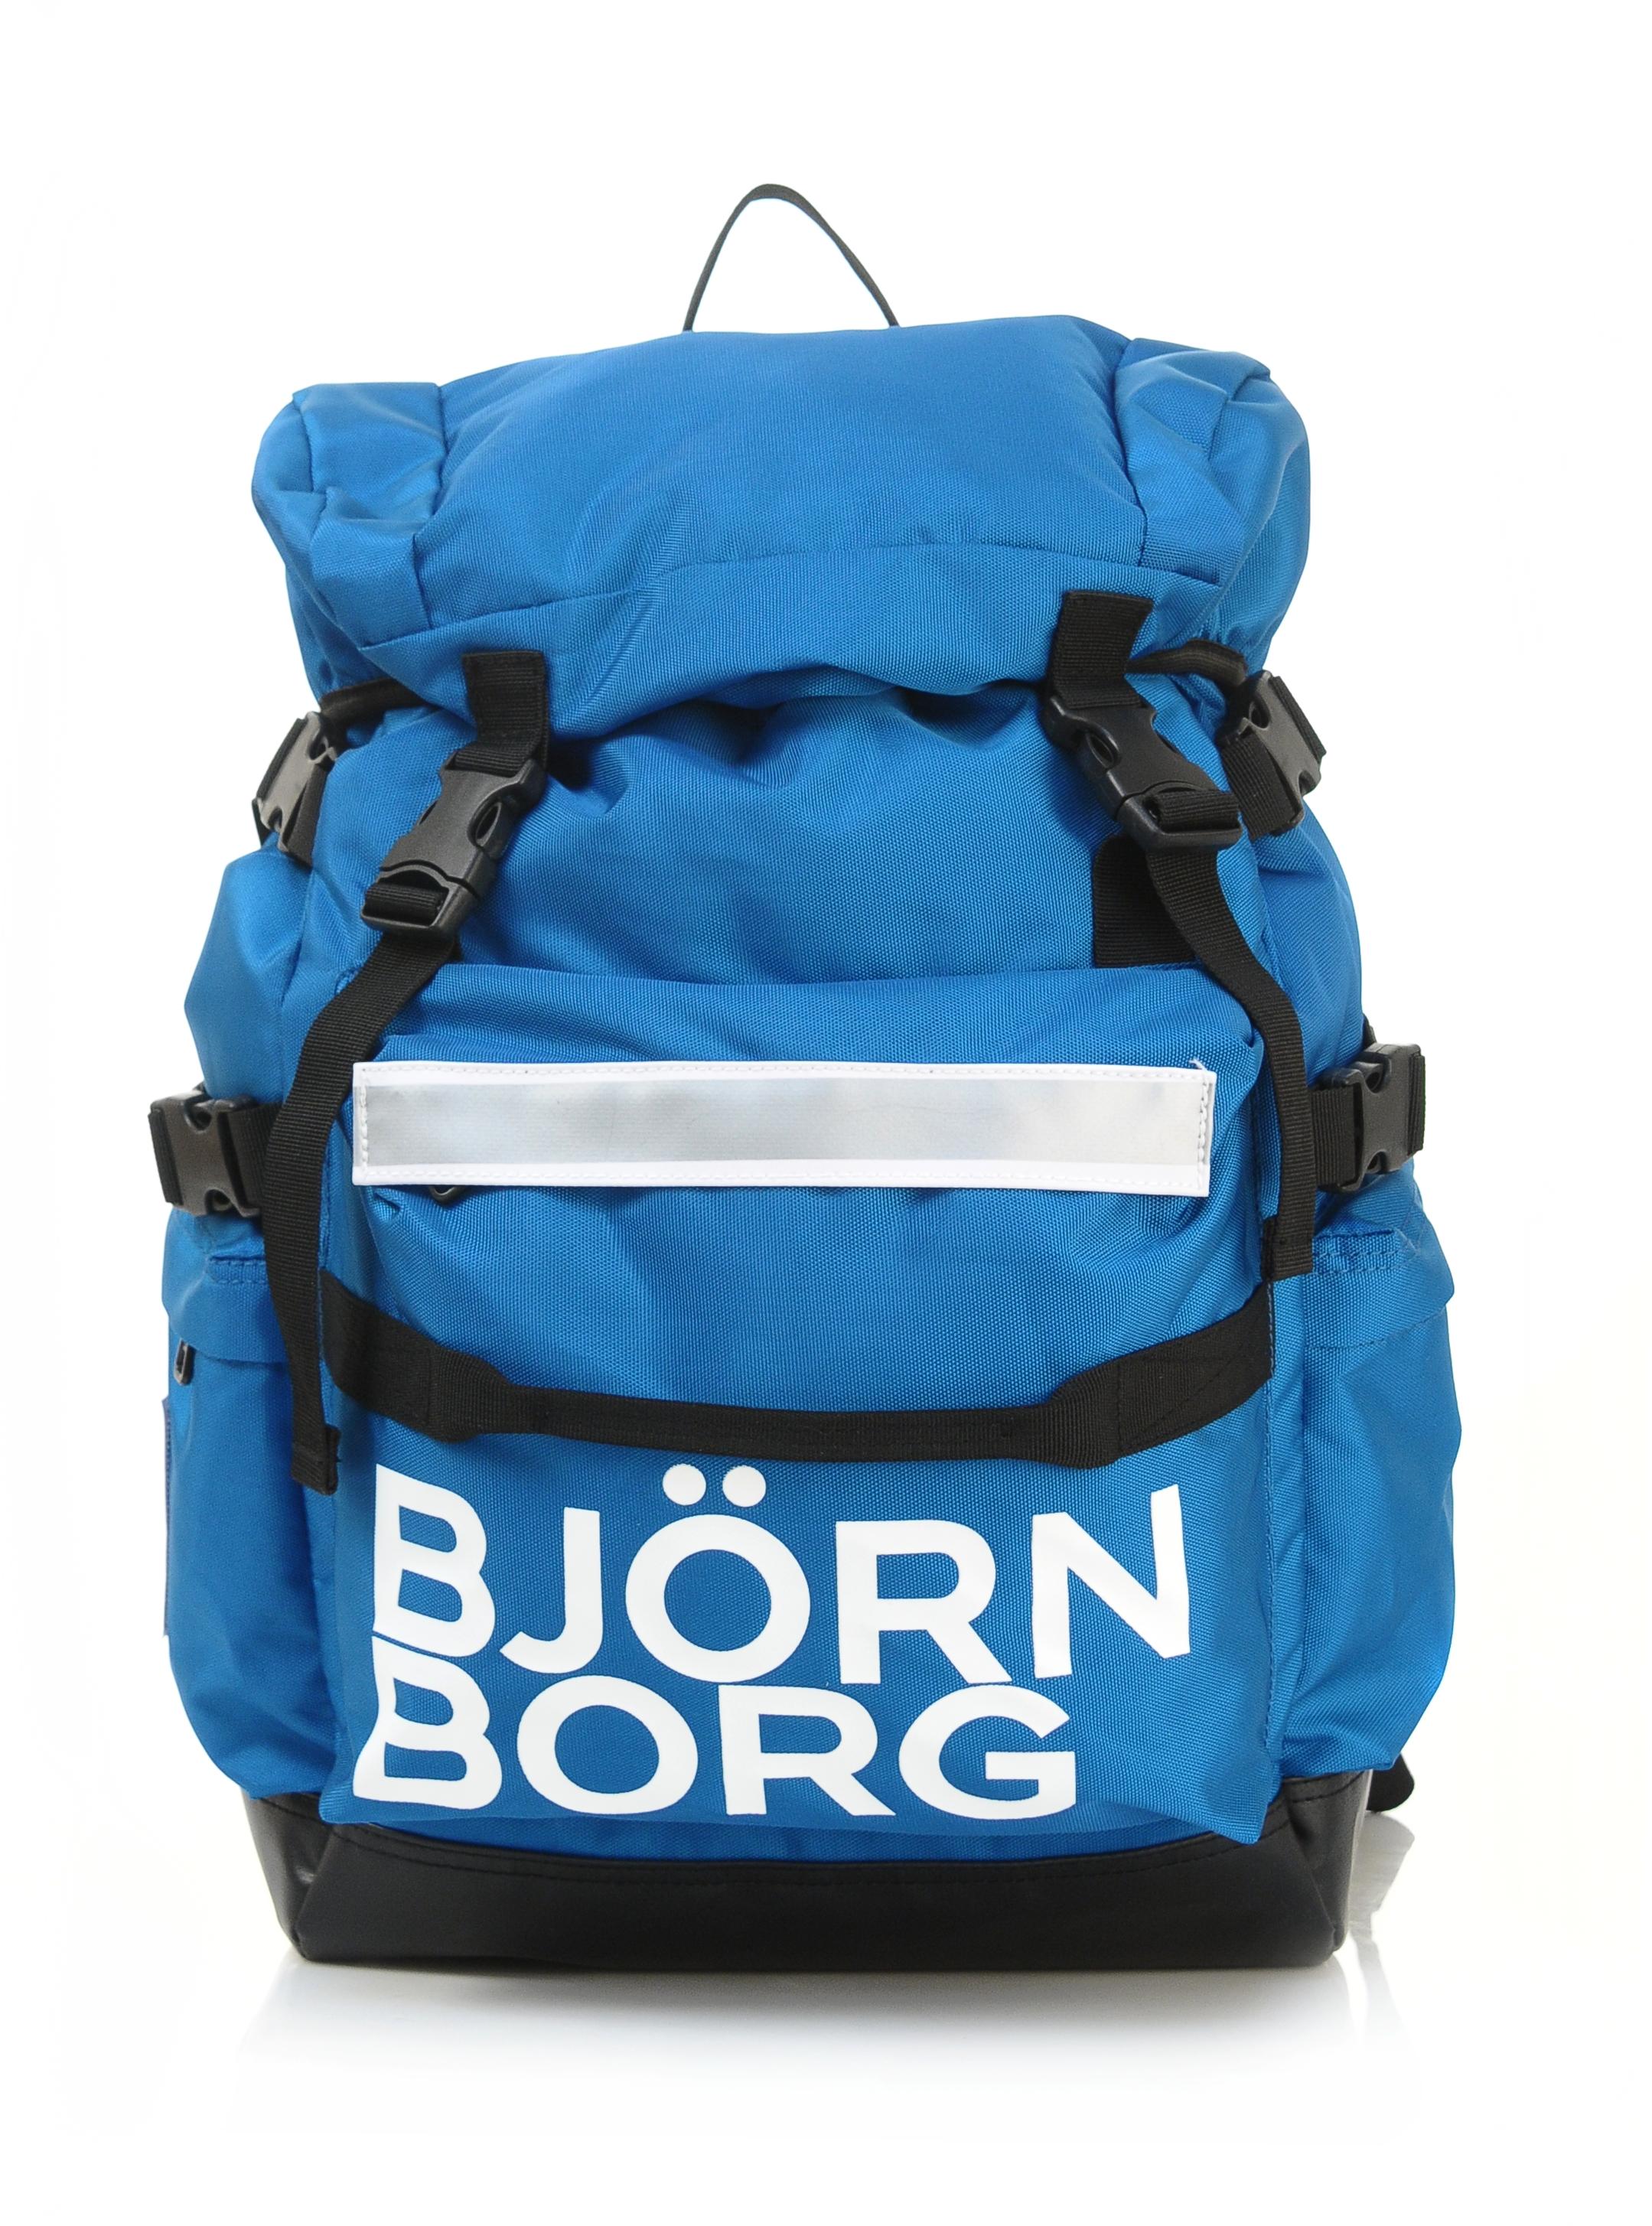 Björn Borg Väskor åhlens : Bj?rn borg v?ska container ryggs?ck bl? designoasen